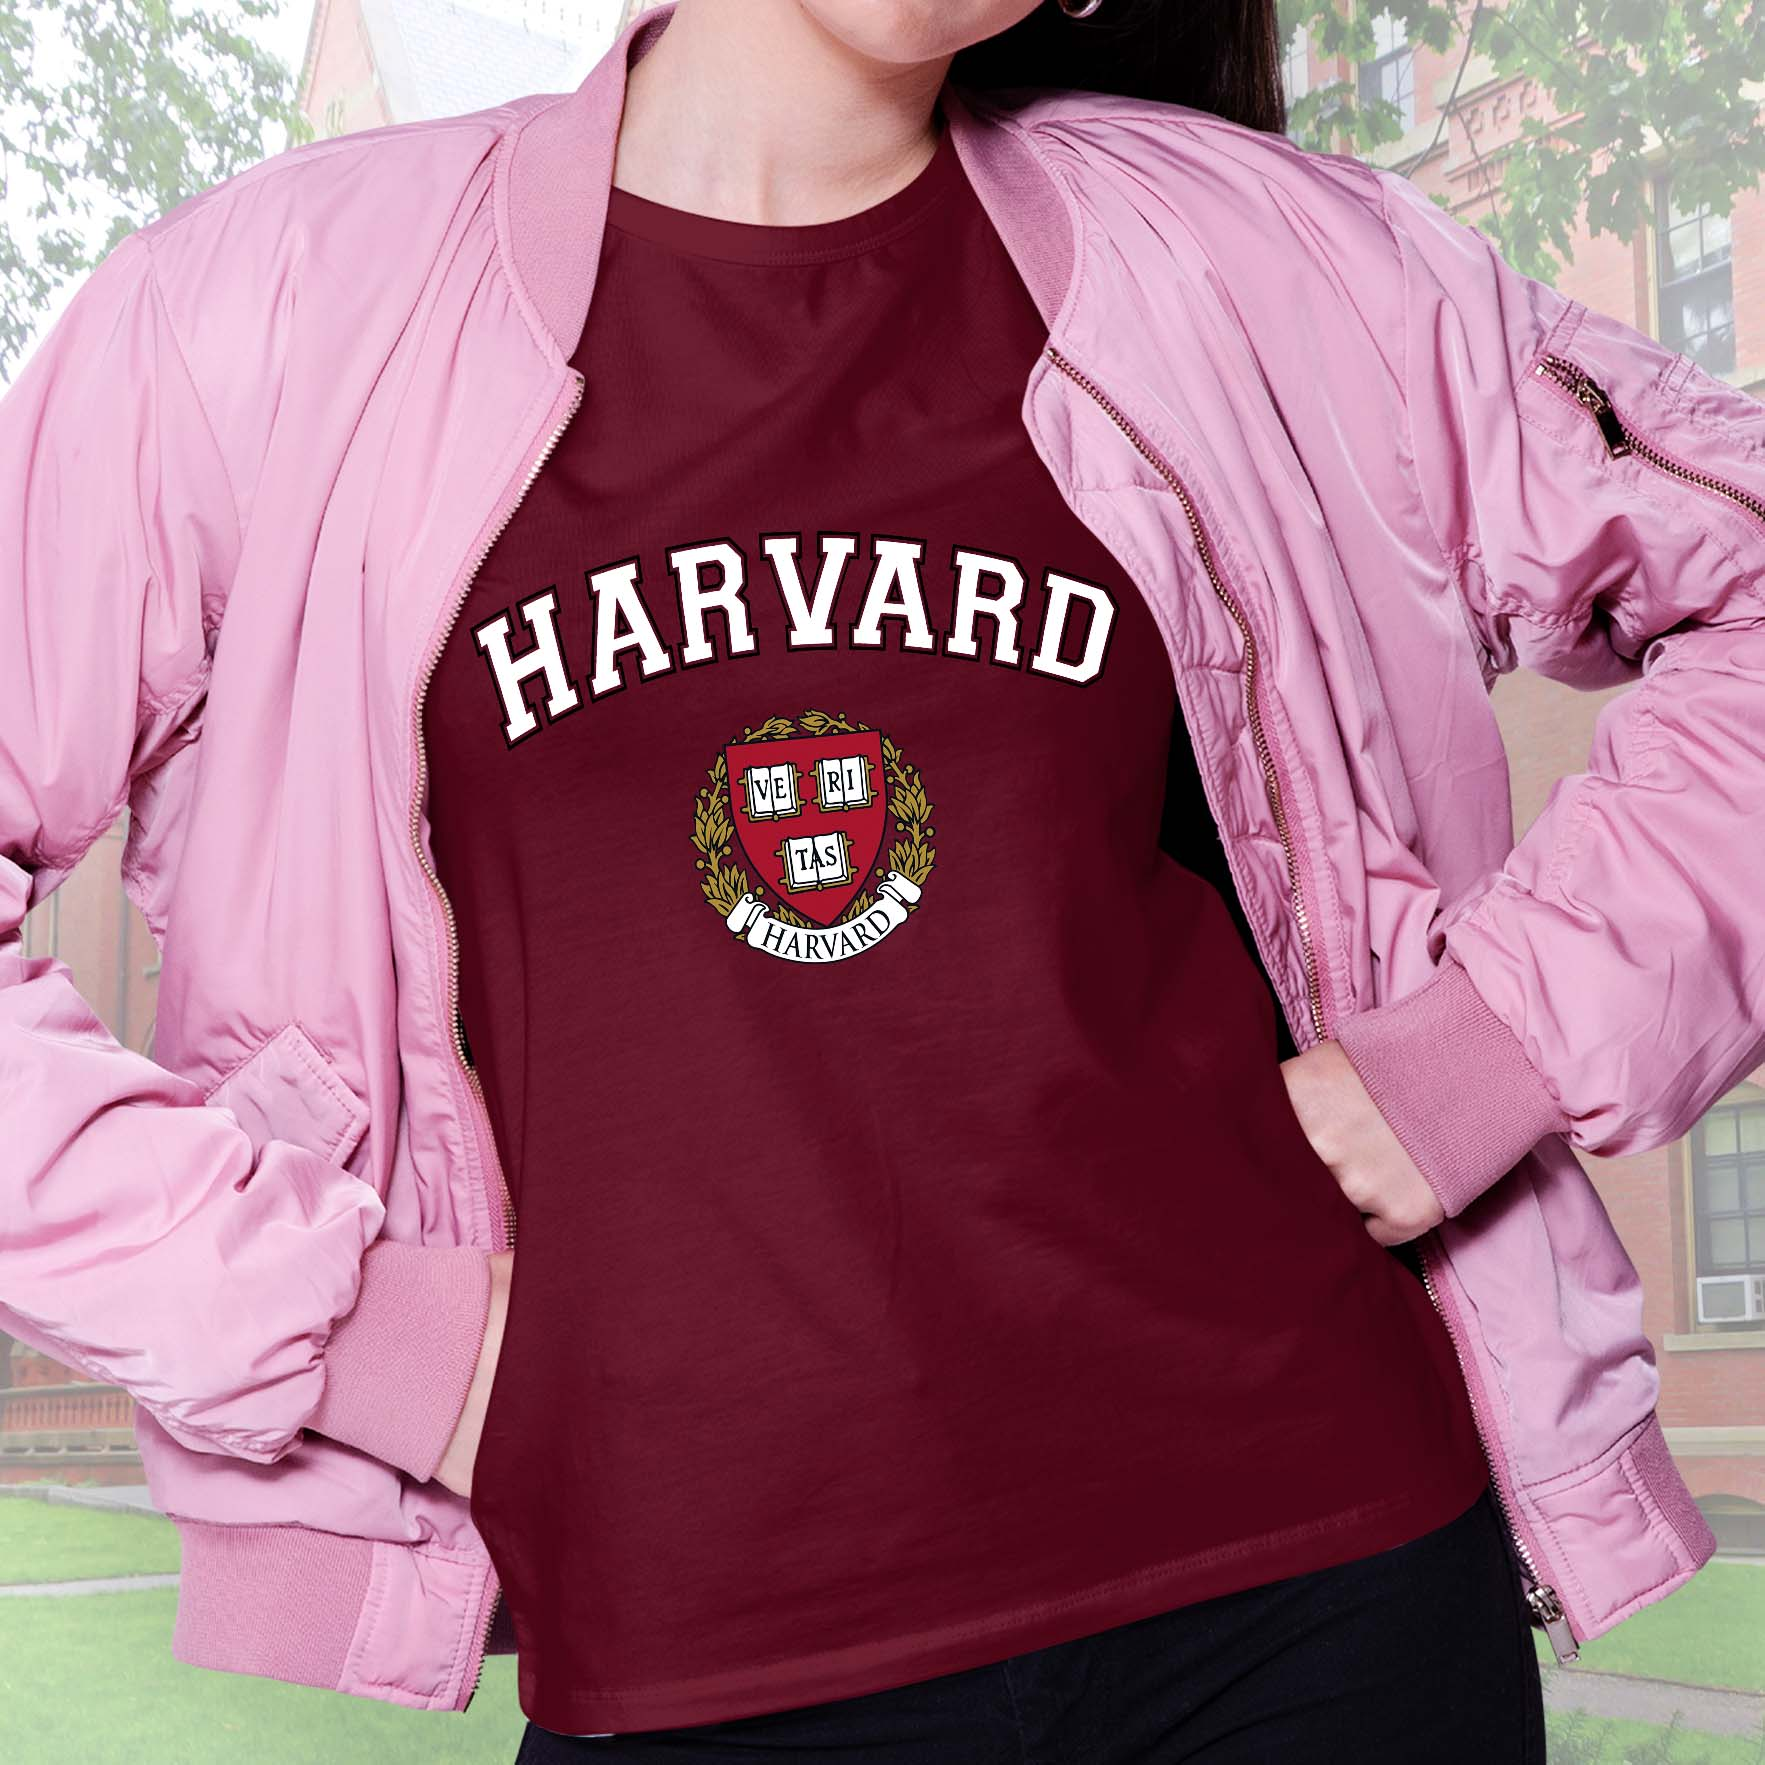 Camiseta Feminina Unissex Universidade Harvard Cambridge Massachusetts Estados Unidos Veritas University (Bordô) - EV